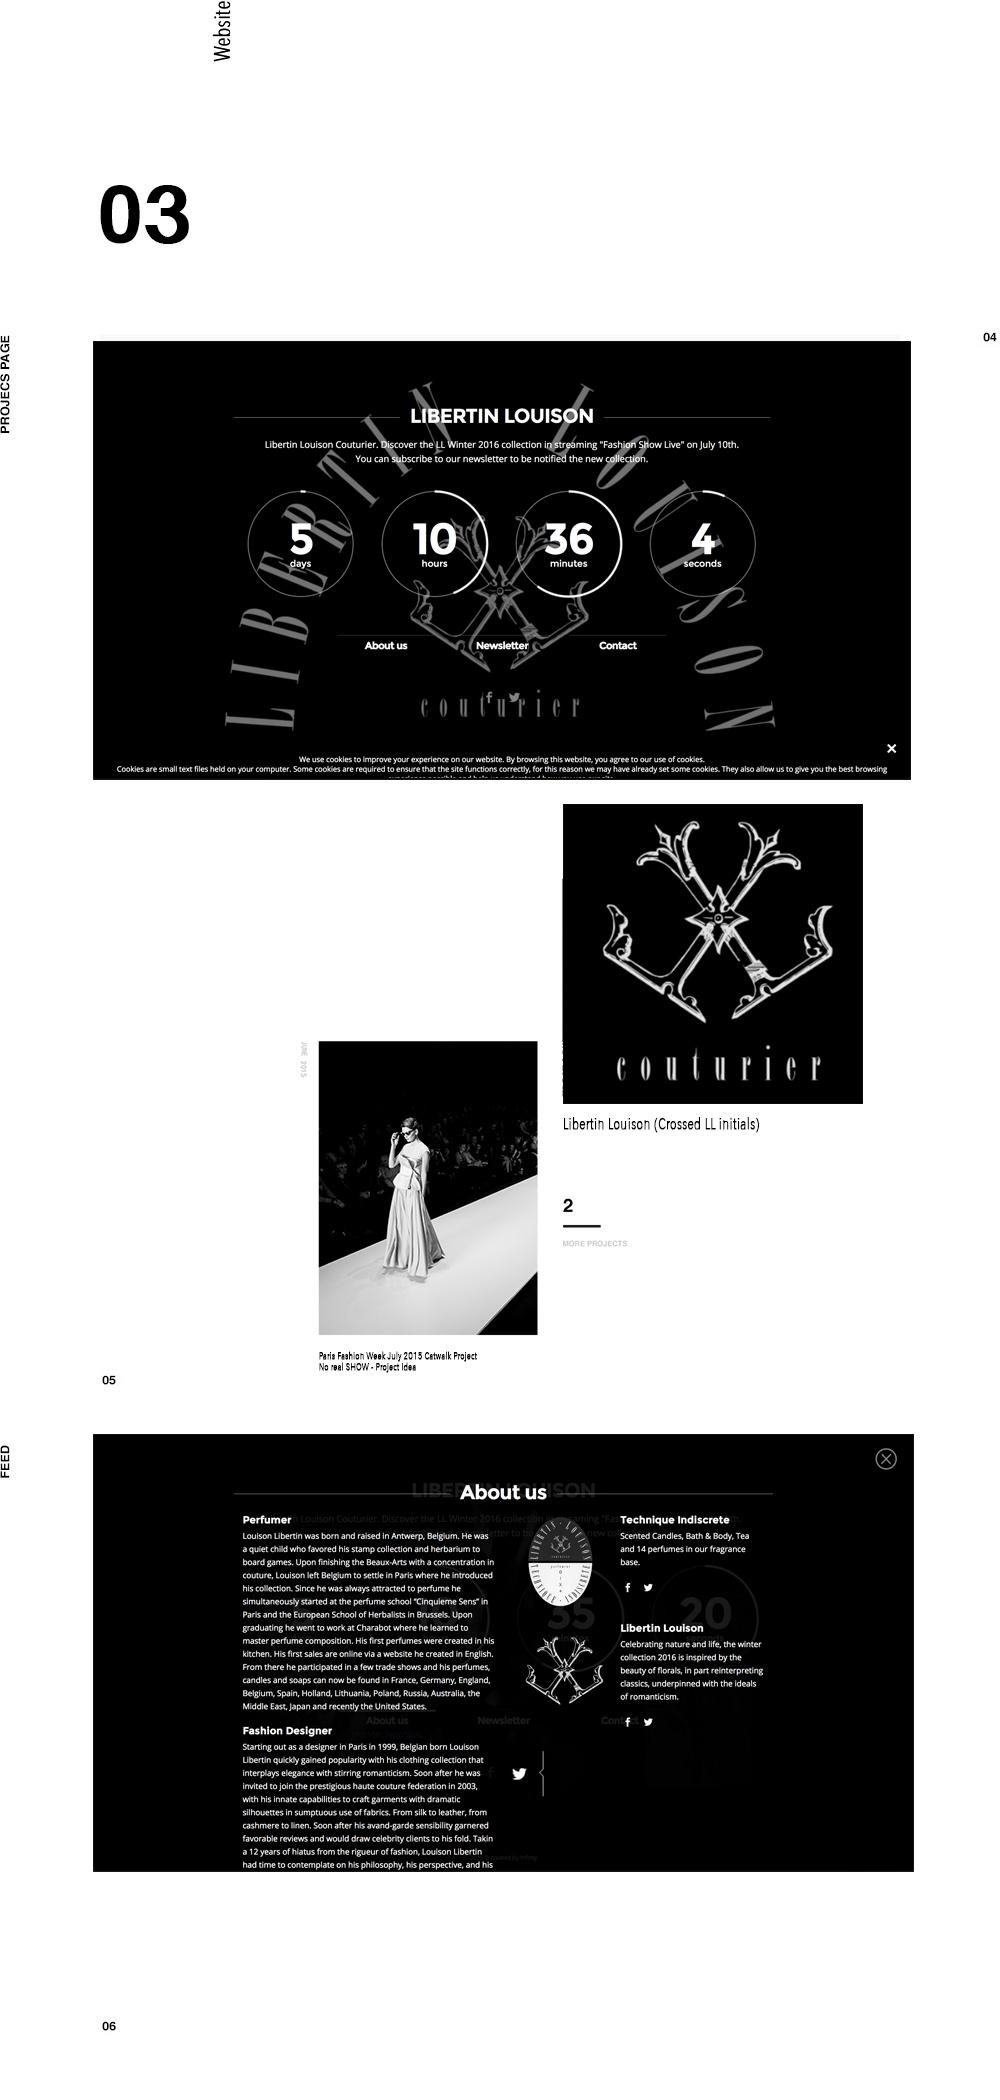 perfume,Logotype,Infinity Agency,garjan atwood,Marla Lombardo,Louison Libertin,technique indiscrete,paris fashion week